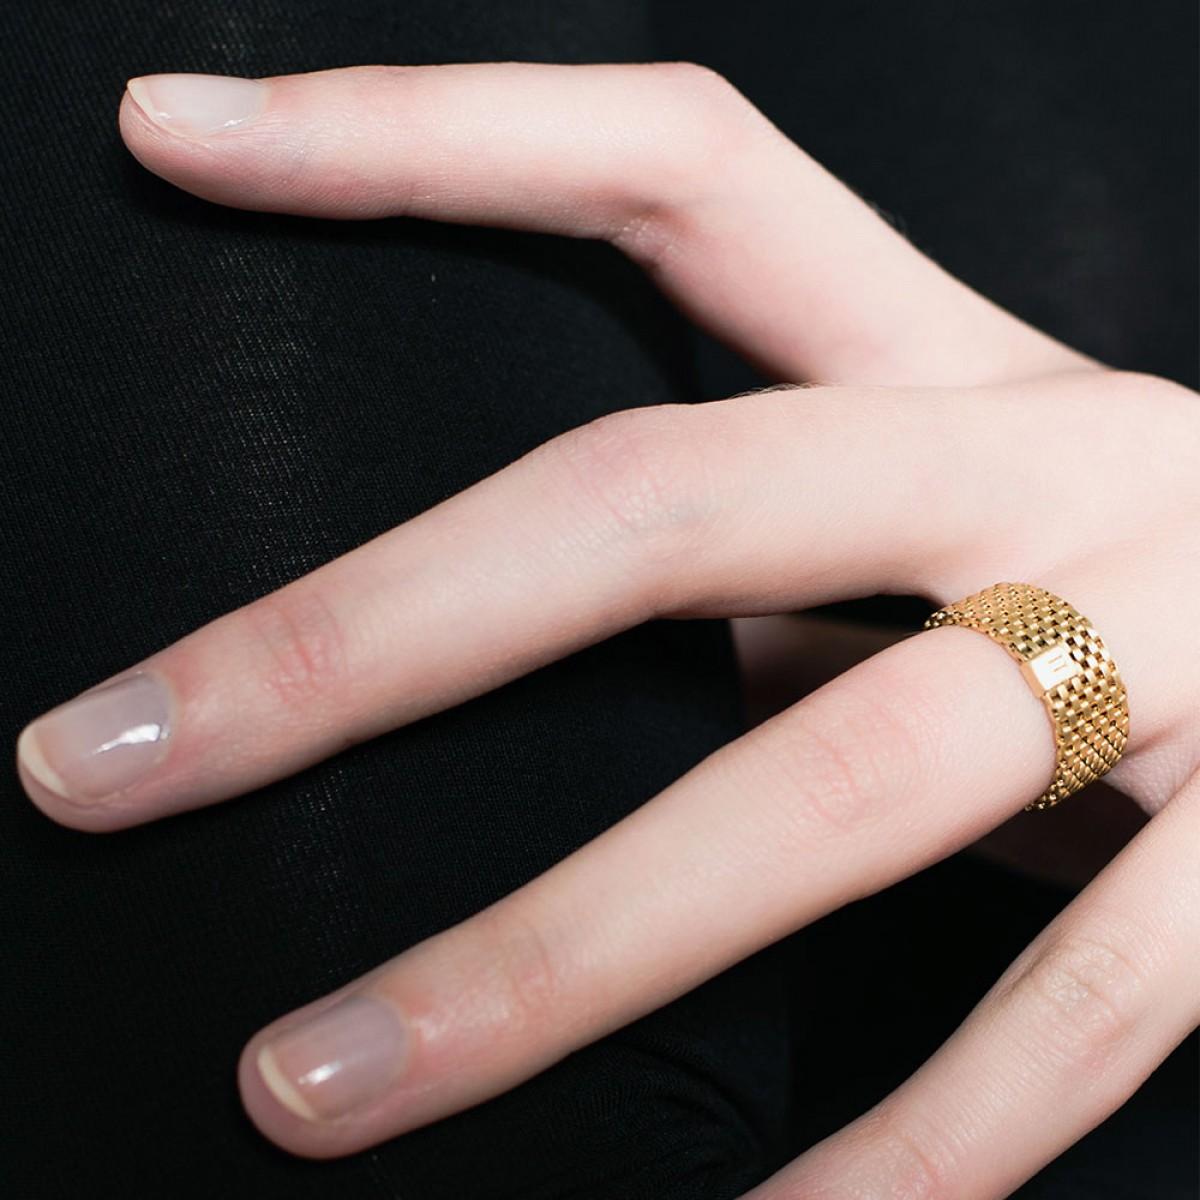 Jasmina Jovy Jewellery Decode! Mesh Ring RIDC03 small gold plated